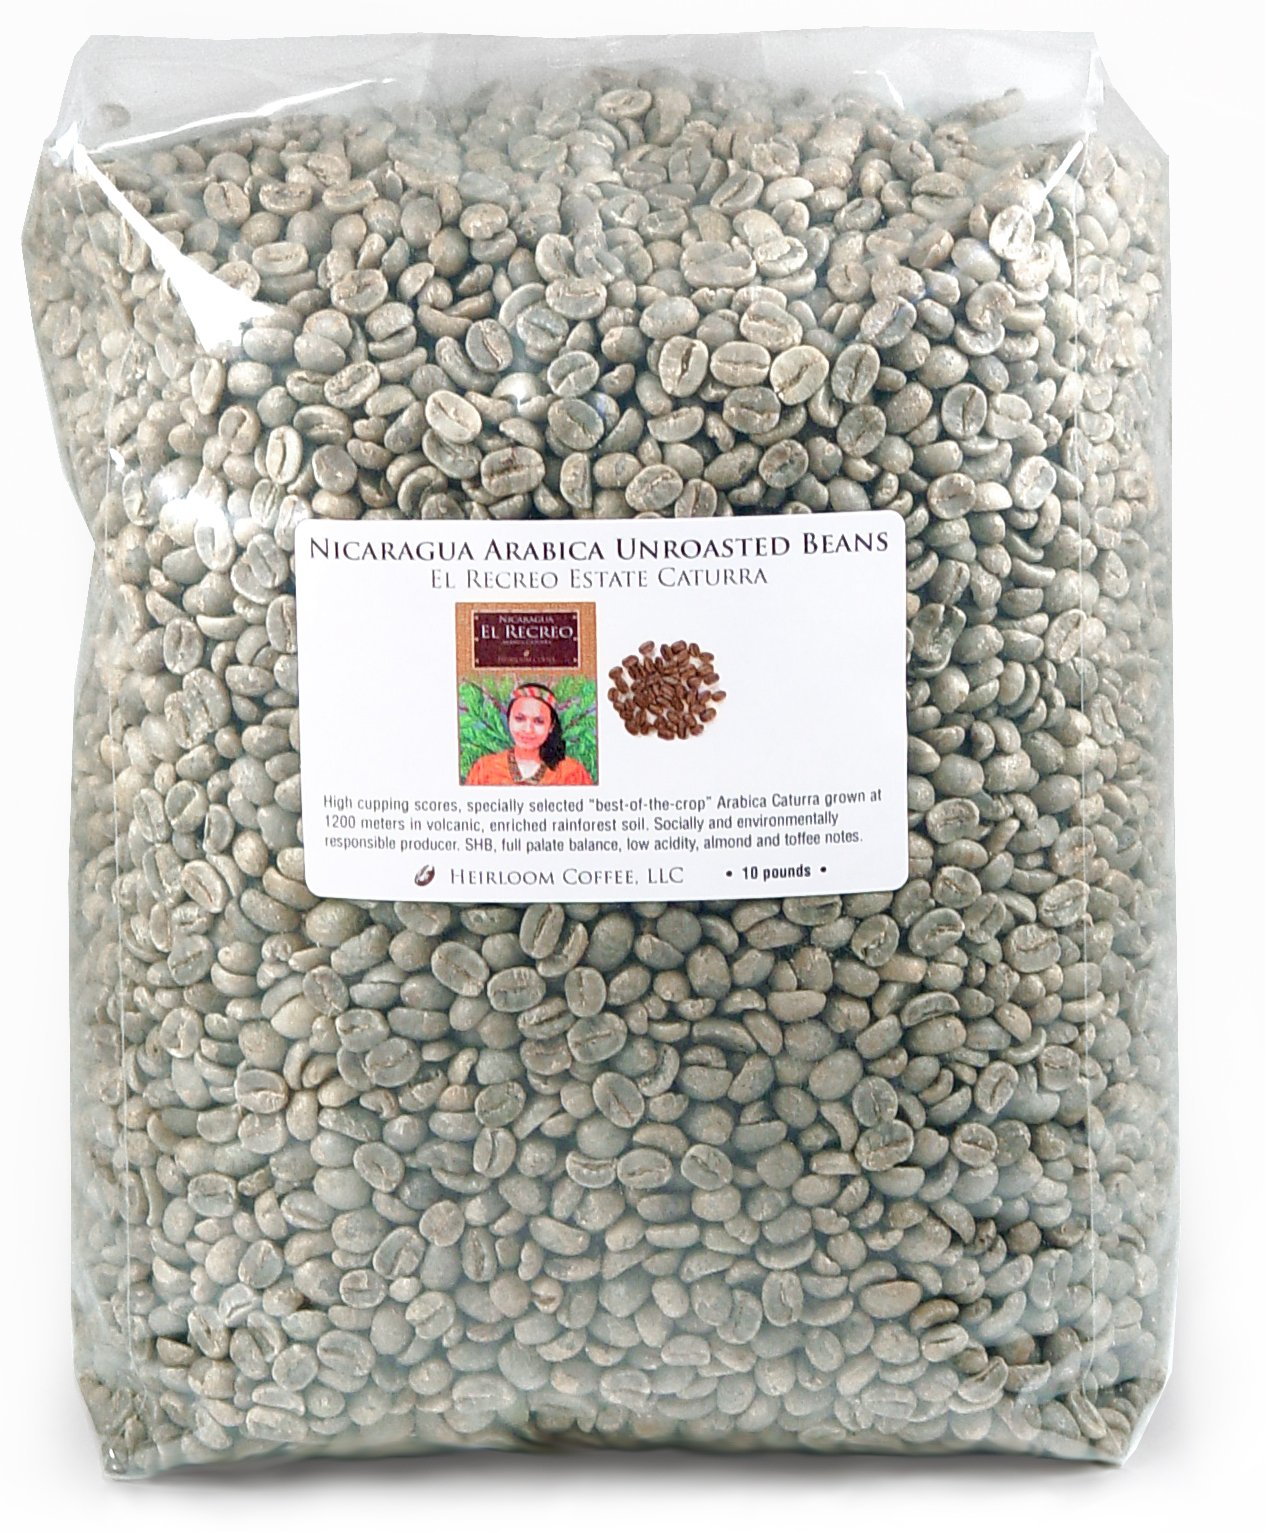 Nicaragua Arabica Unroasted Green Coffee Beans (10 LB) by Heirloom Coffee LLC